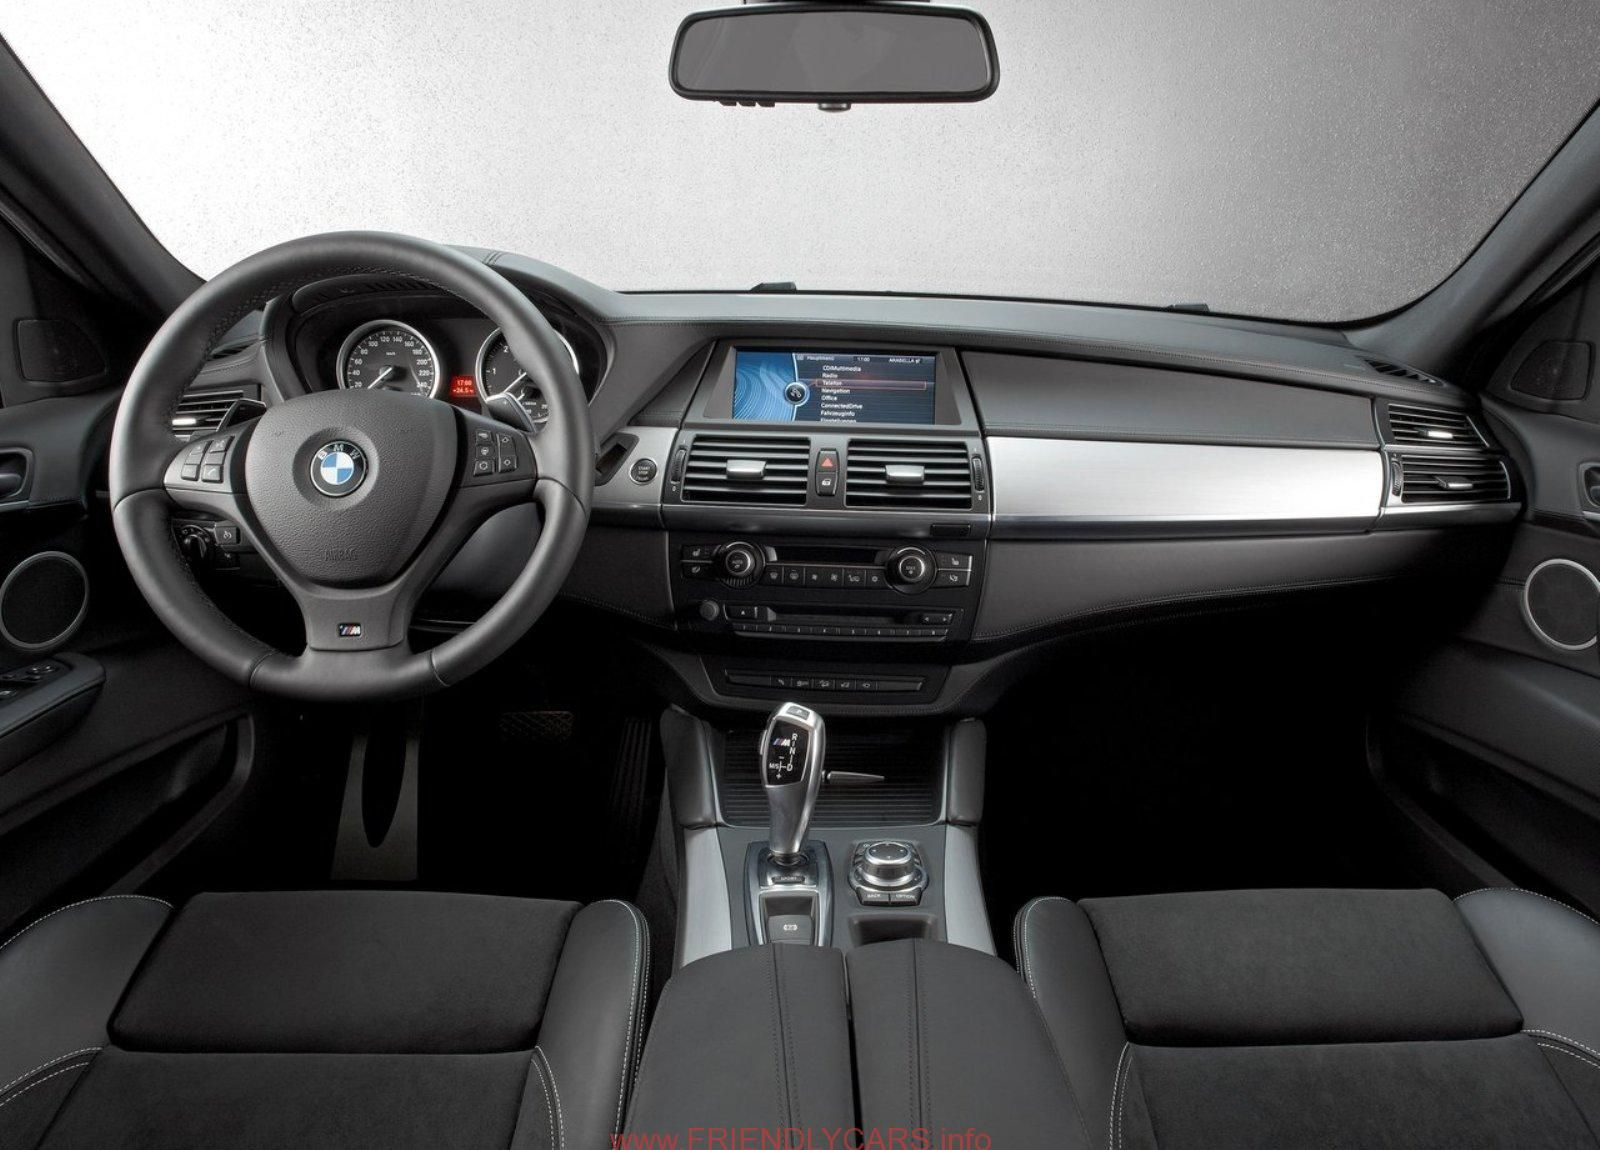 Nice 2013 X6 Bmw Interior Car Images Hd Bmw X6 M50d 2013 Auto